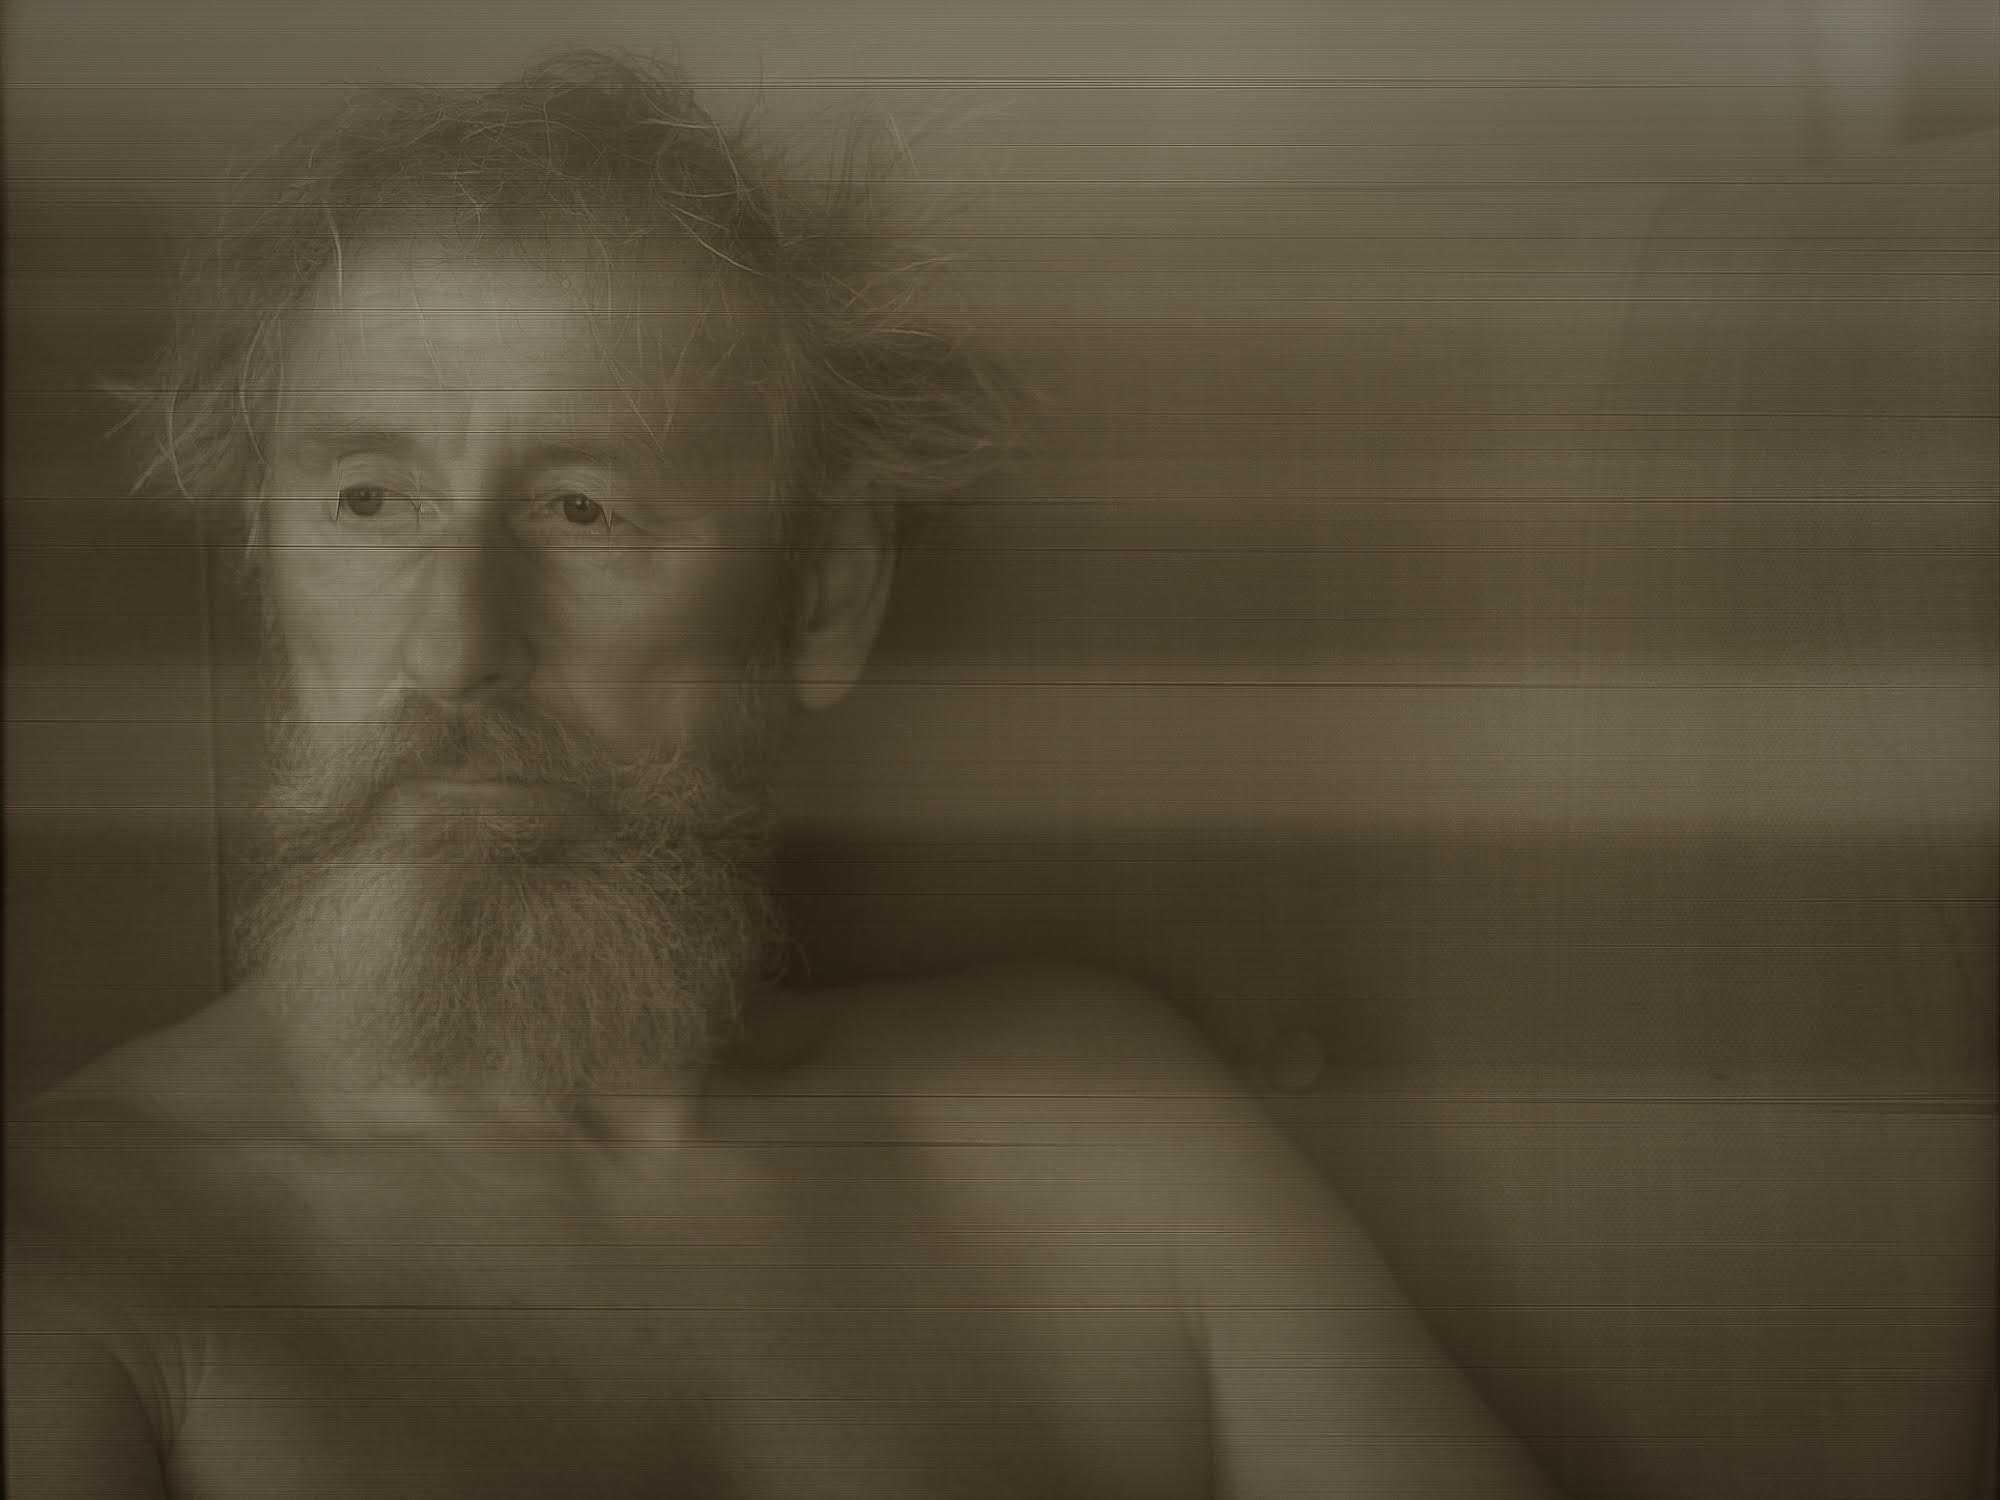 David West 'SelfPortrait'